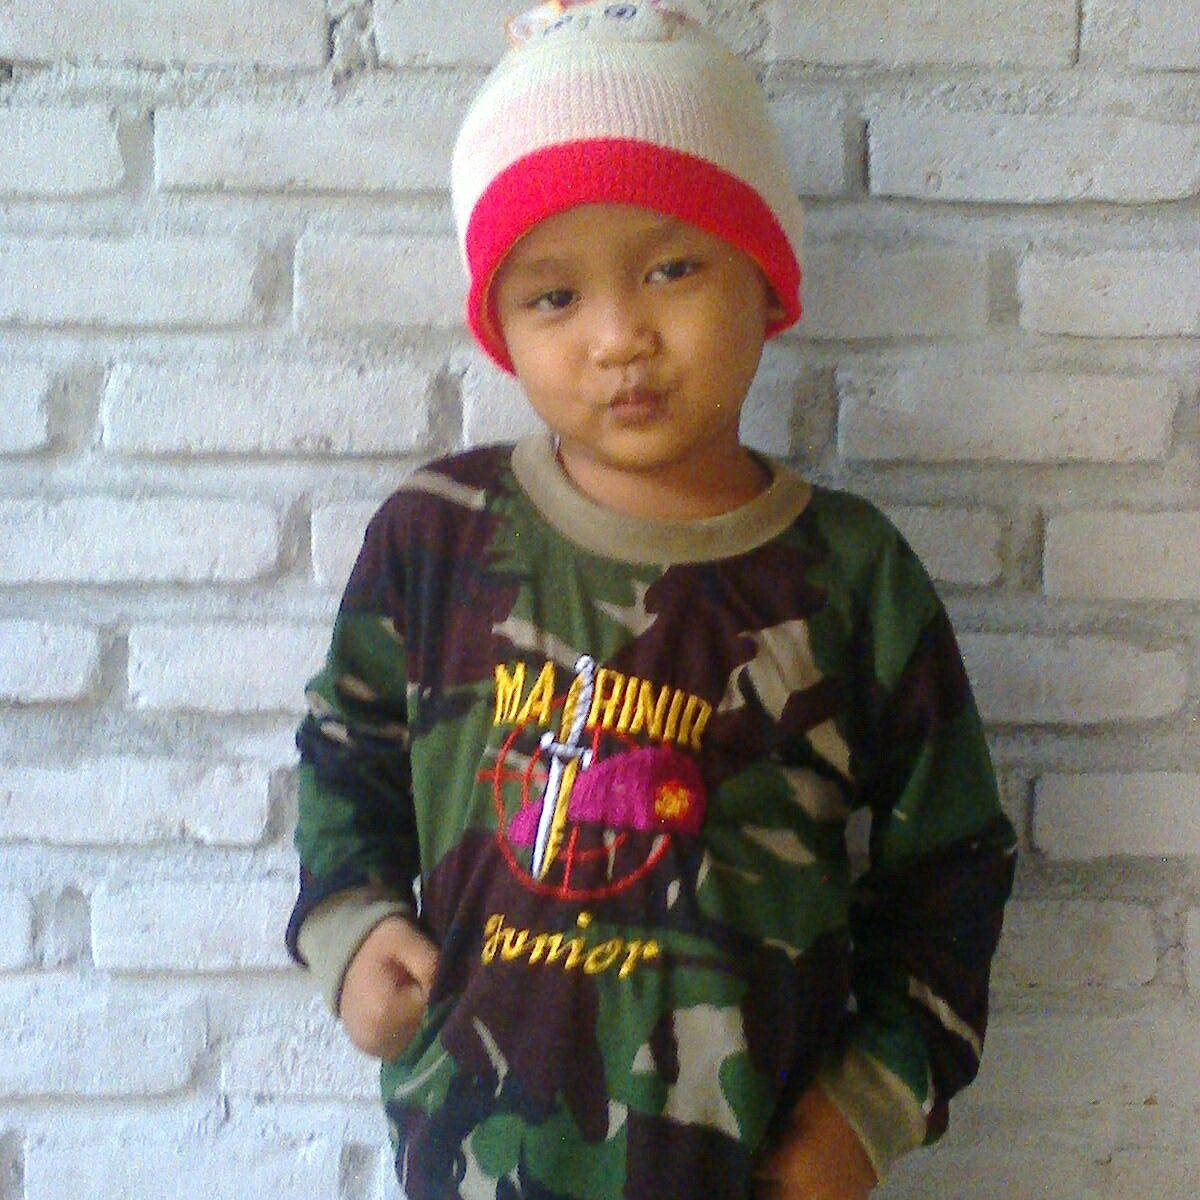 Iqbal marinir junior